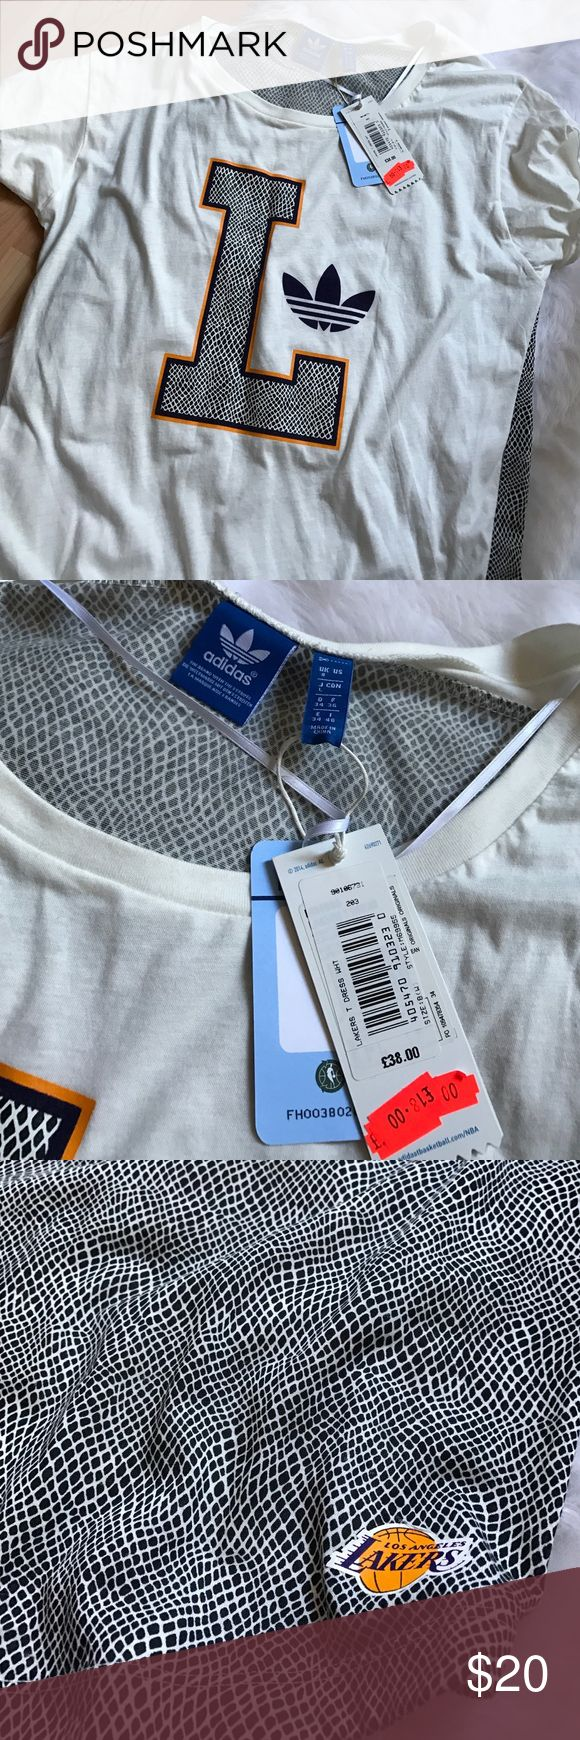 Adidas la lakers shirt new with tag New with tag size UK8 Adidas Tops Tees - Short Sleeve